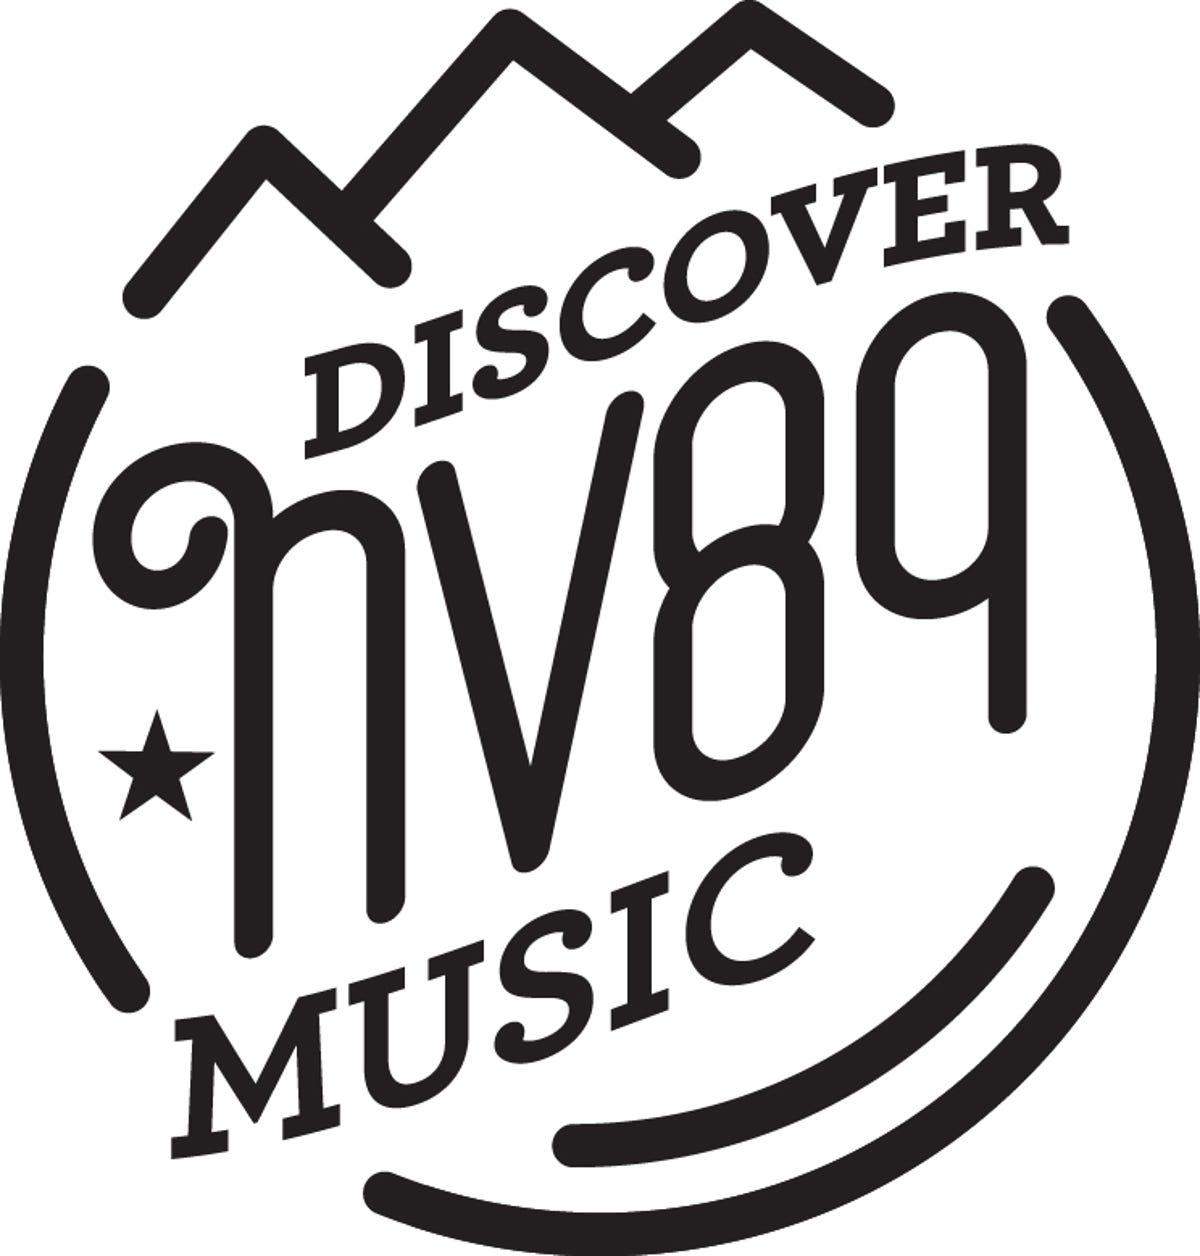 Nevada Public Radio lays off all NV89 staff in Reno amid